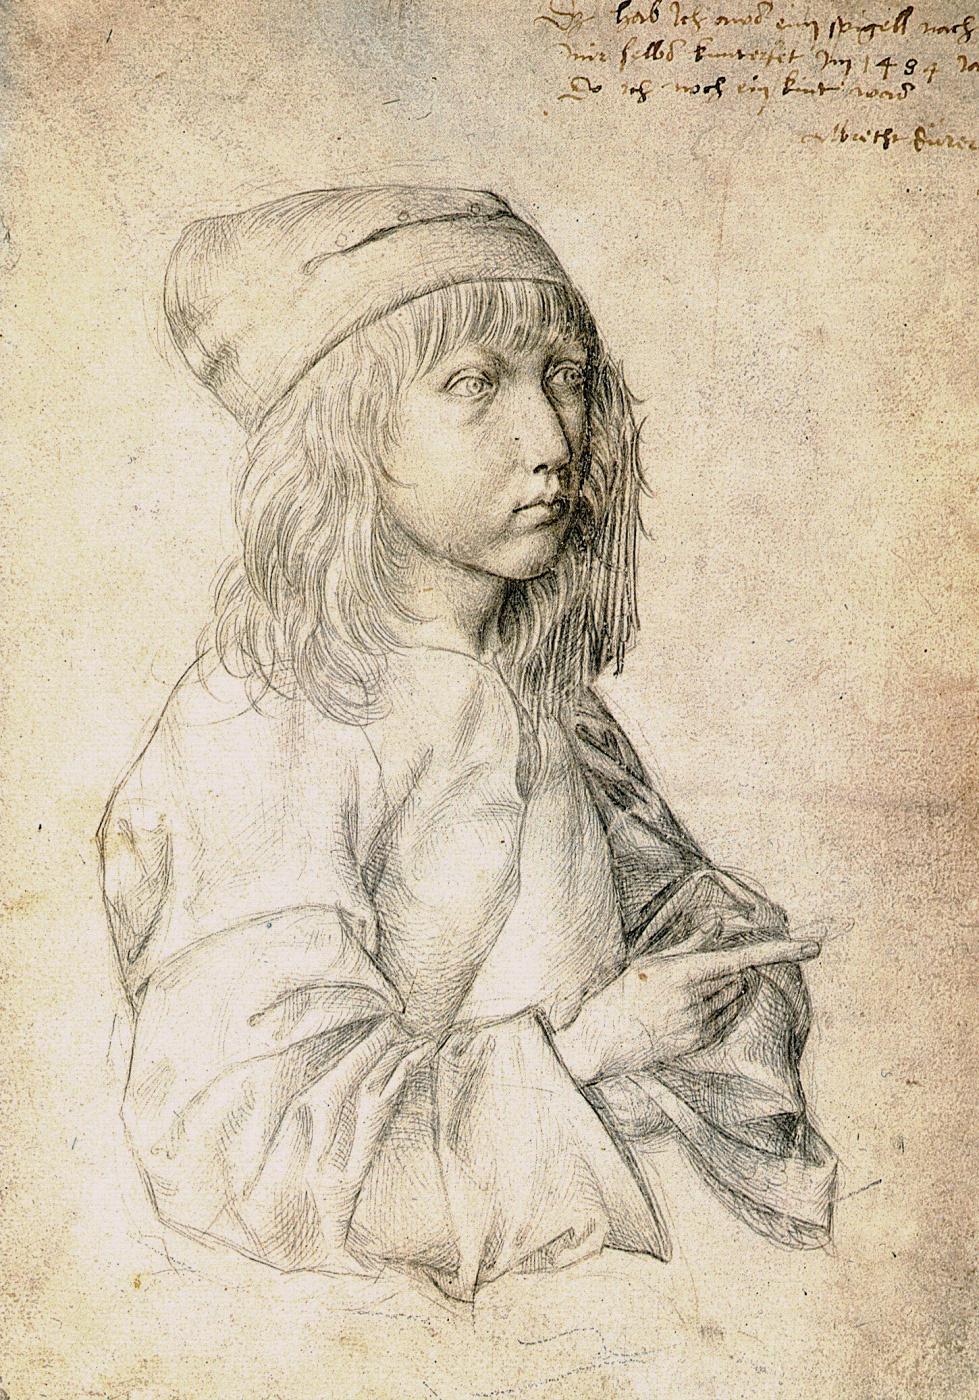 Albrecht Dürer. Self-portrait at the age of 13